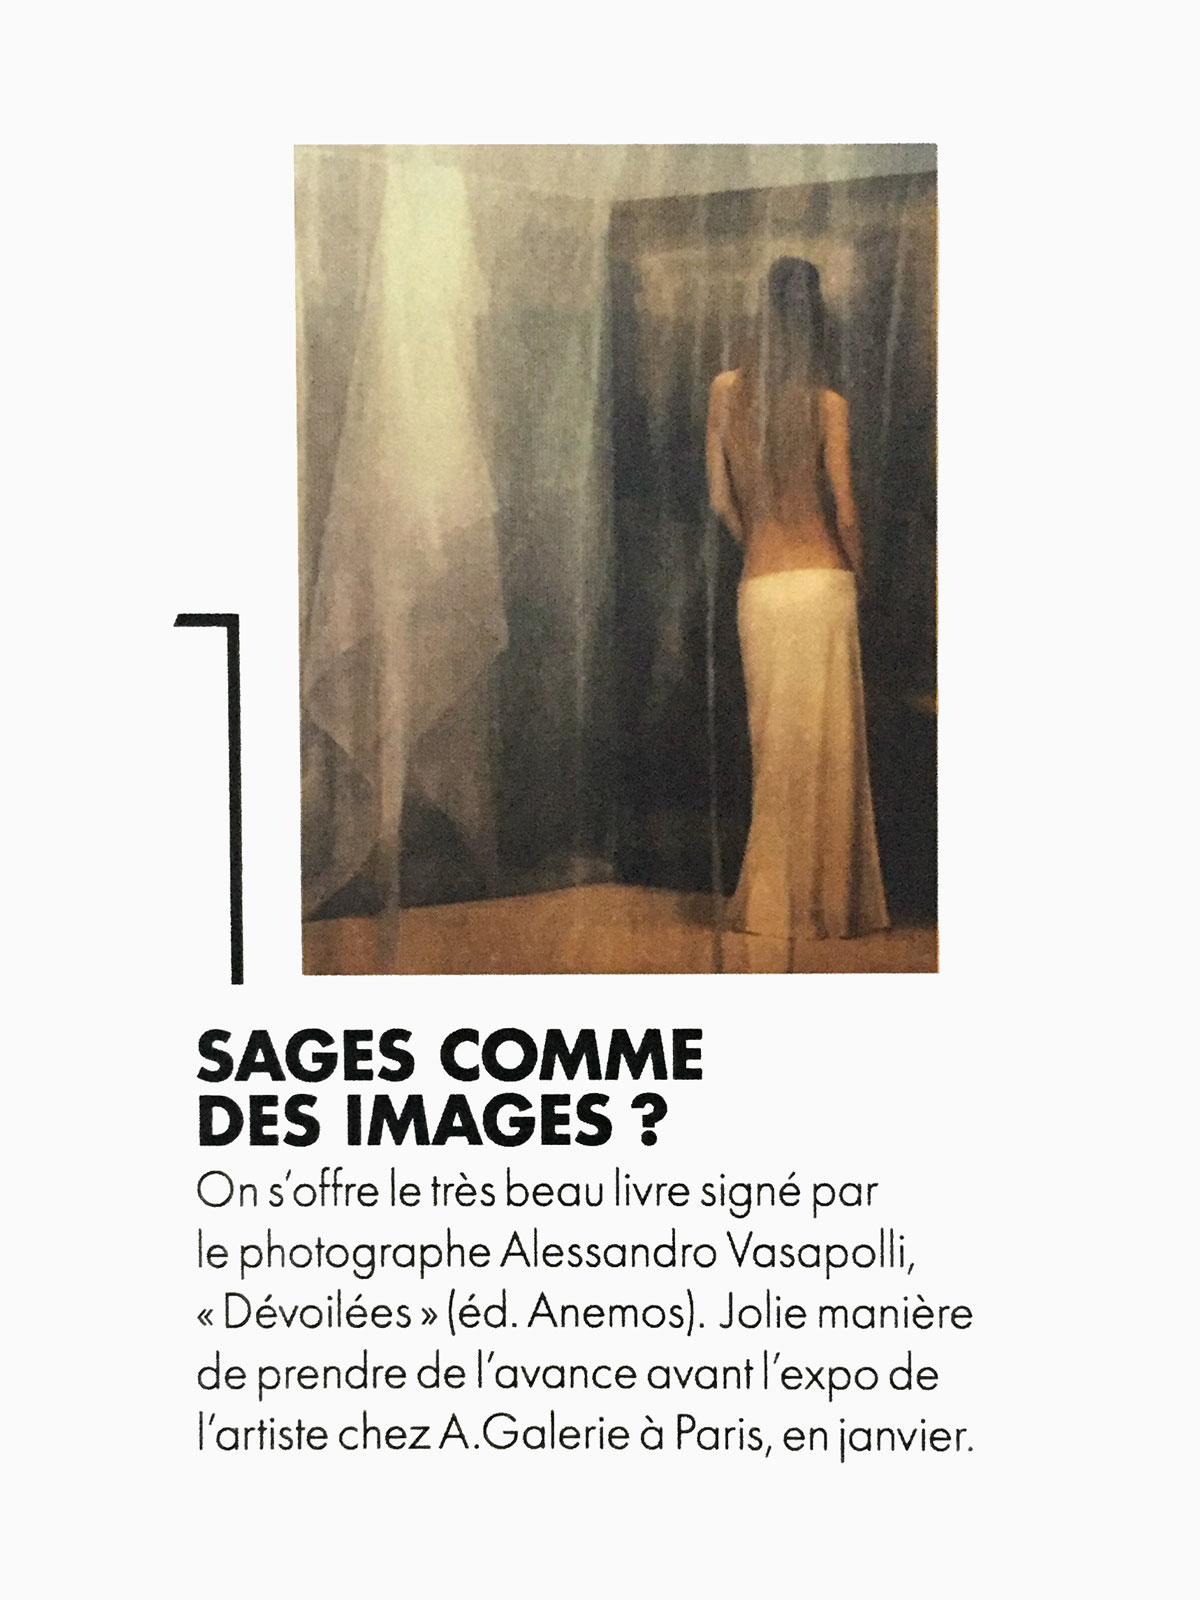 Alessandro_Vasapolli_DeVoilees_Elle_France_12_10_2018